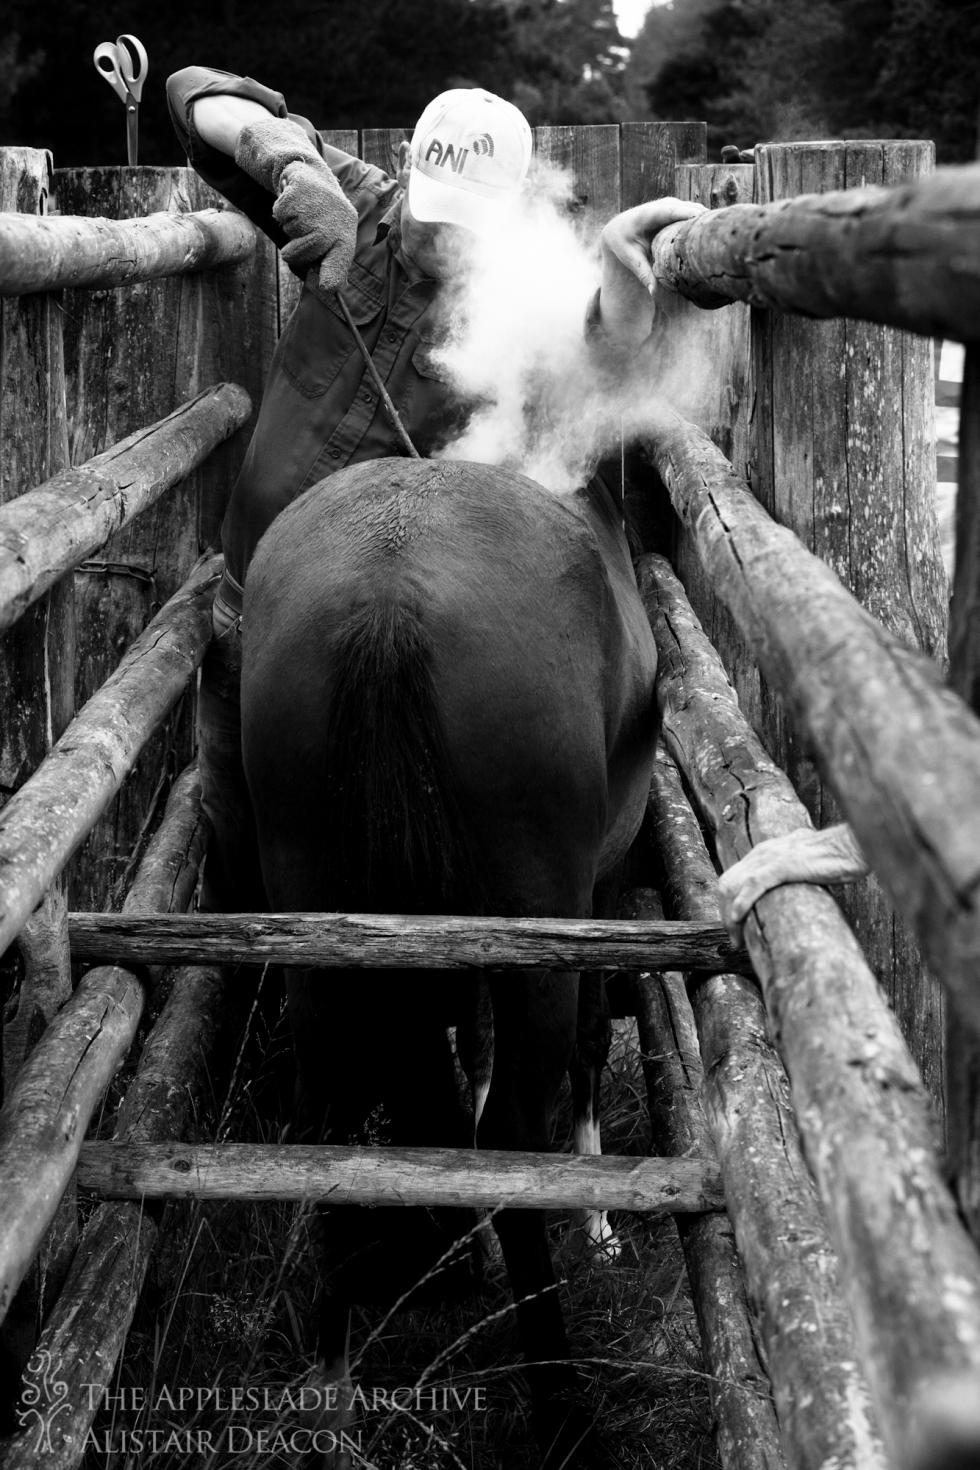 Jonathan Gerrelli branding a pony at the Slufters Drift, Slufters Wood, New Forest, Hampshire, 13th Sept 2013